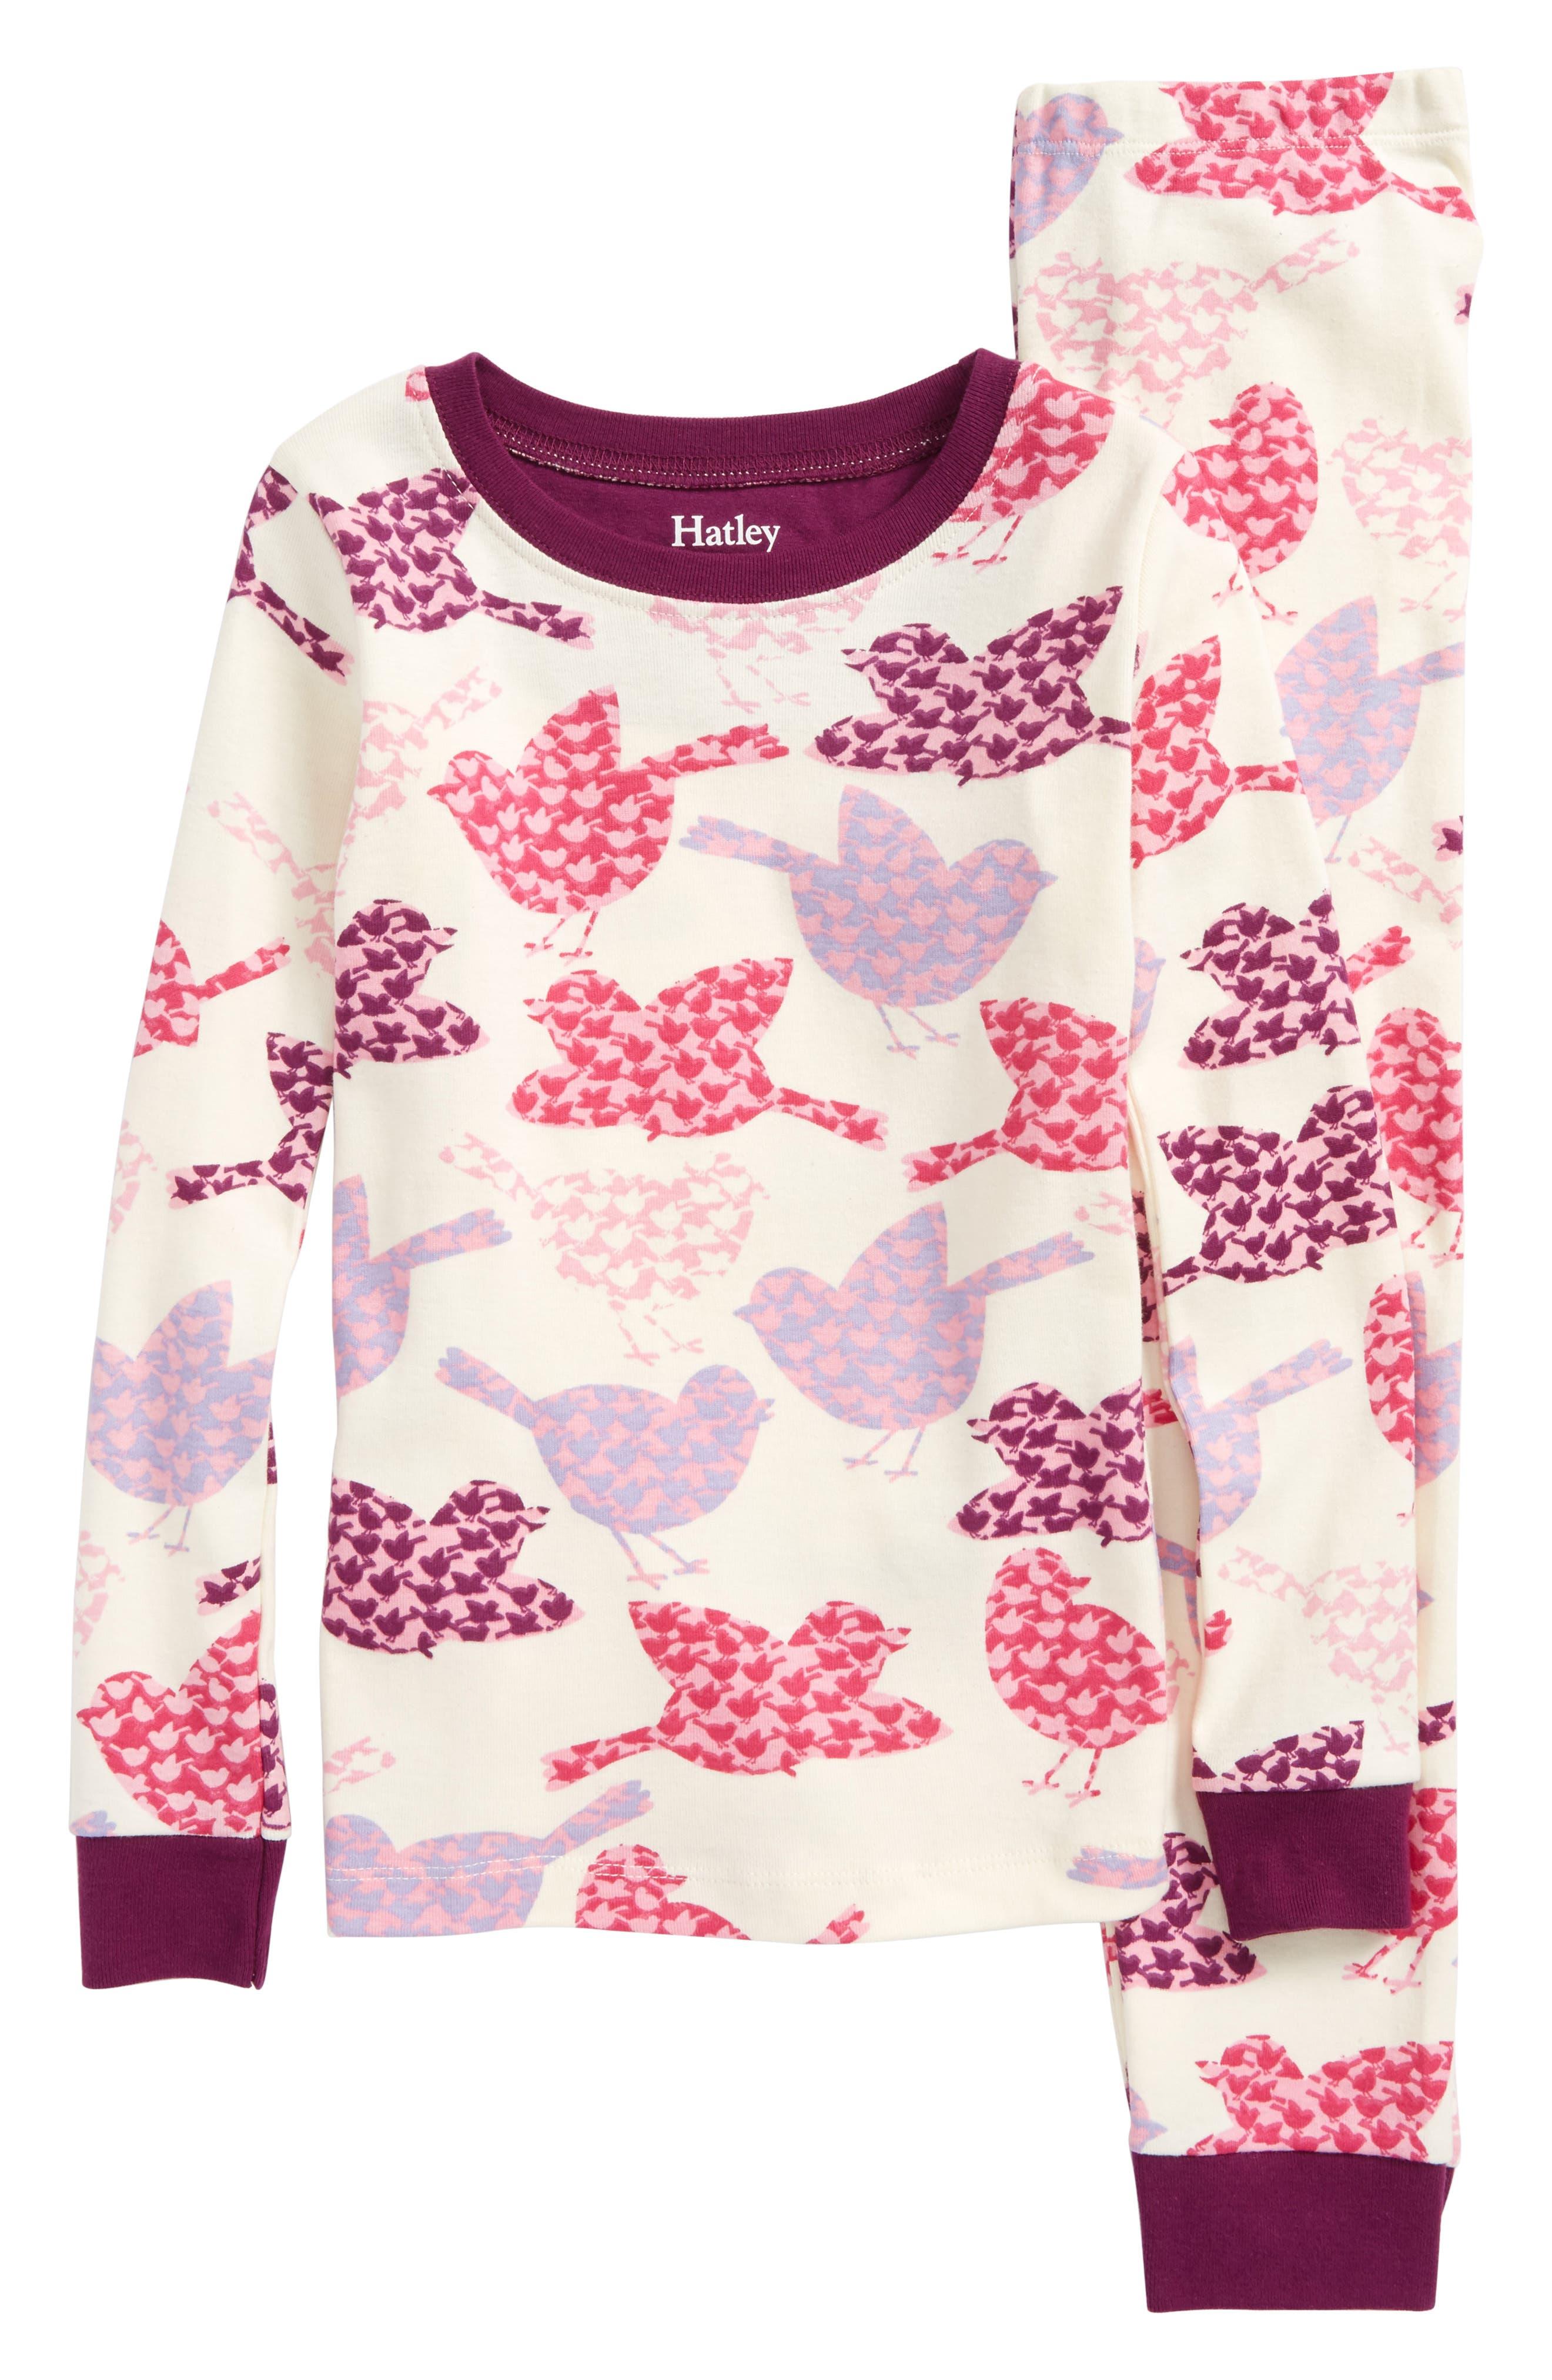 Alternate Image 1 Selected - Hatley Bird Print Organic Cotton Fitted Two-Piece Pajamas (Toddler Girls, Little Girls & Big Girls)